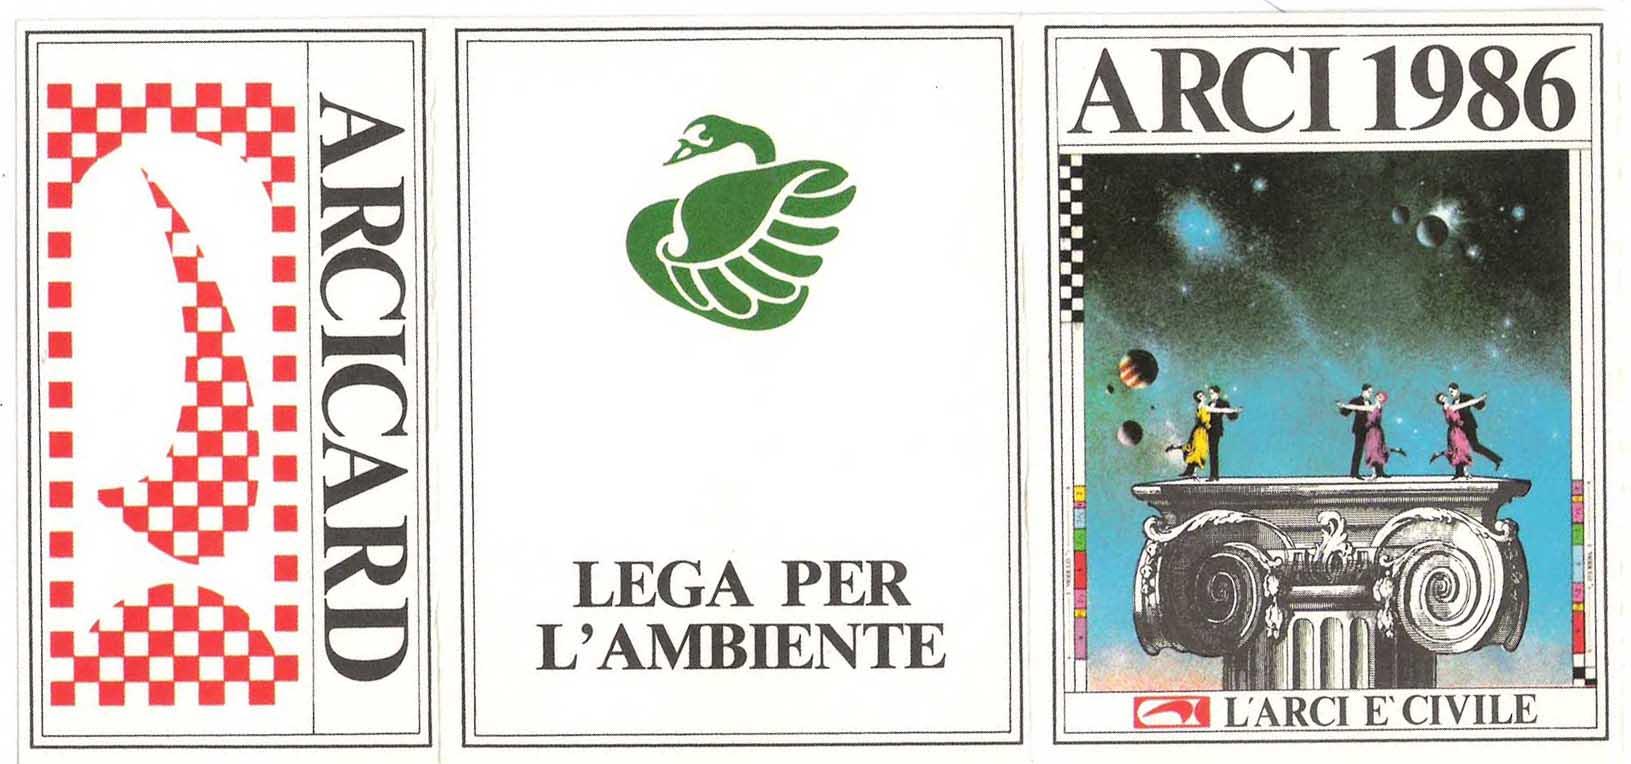 Tessera Legambiente 1986